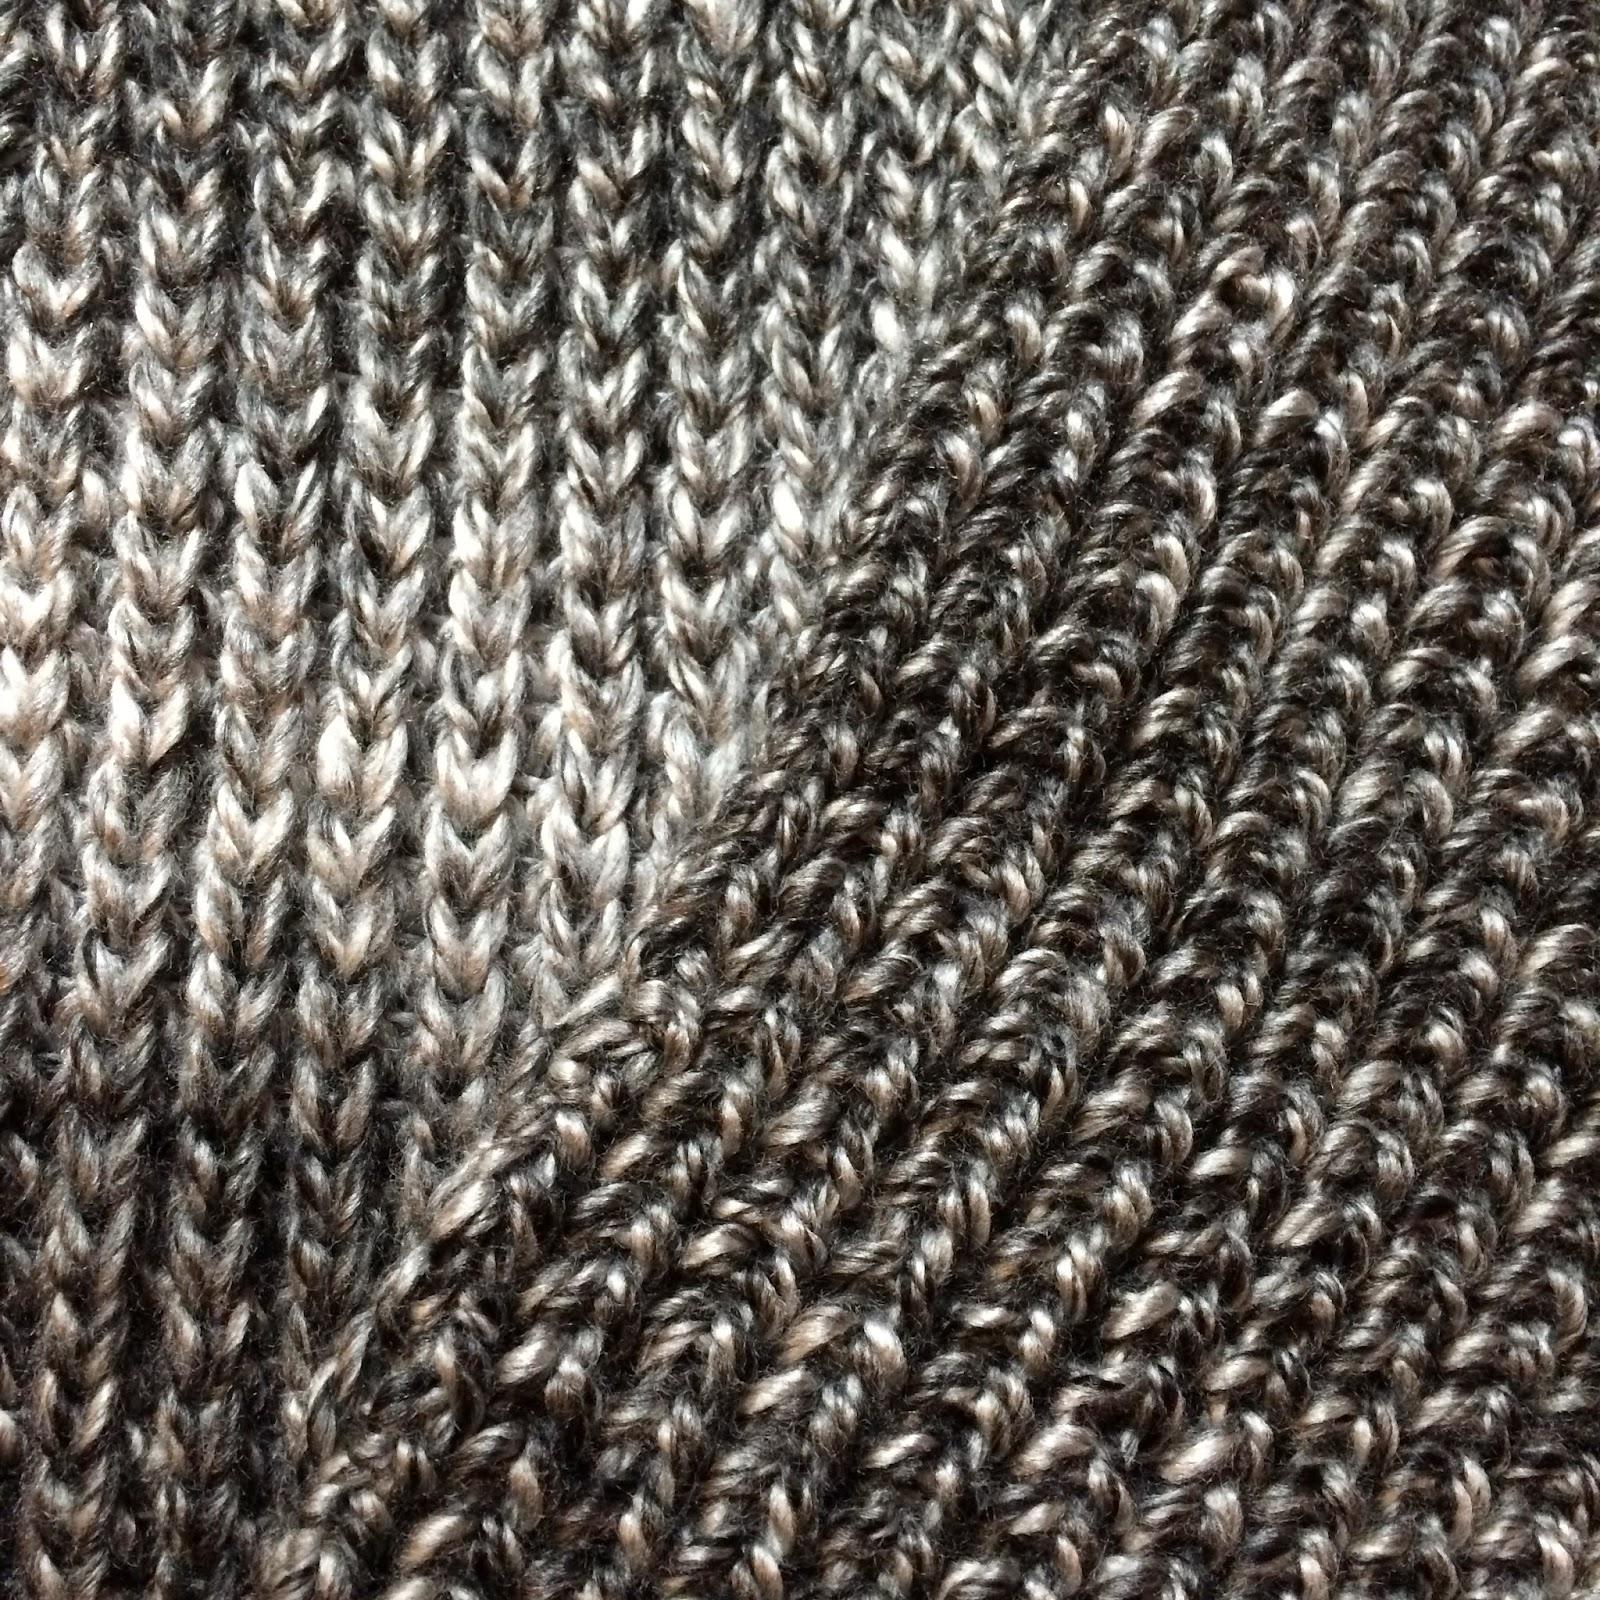 Machine Knitting Fun: Double Rib, English Rib, Fisherman\'s Rib Oh My!